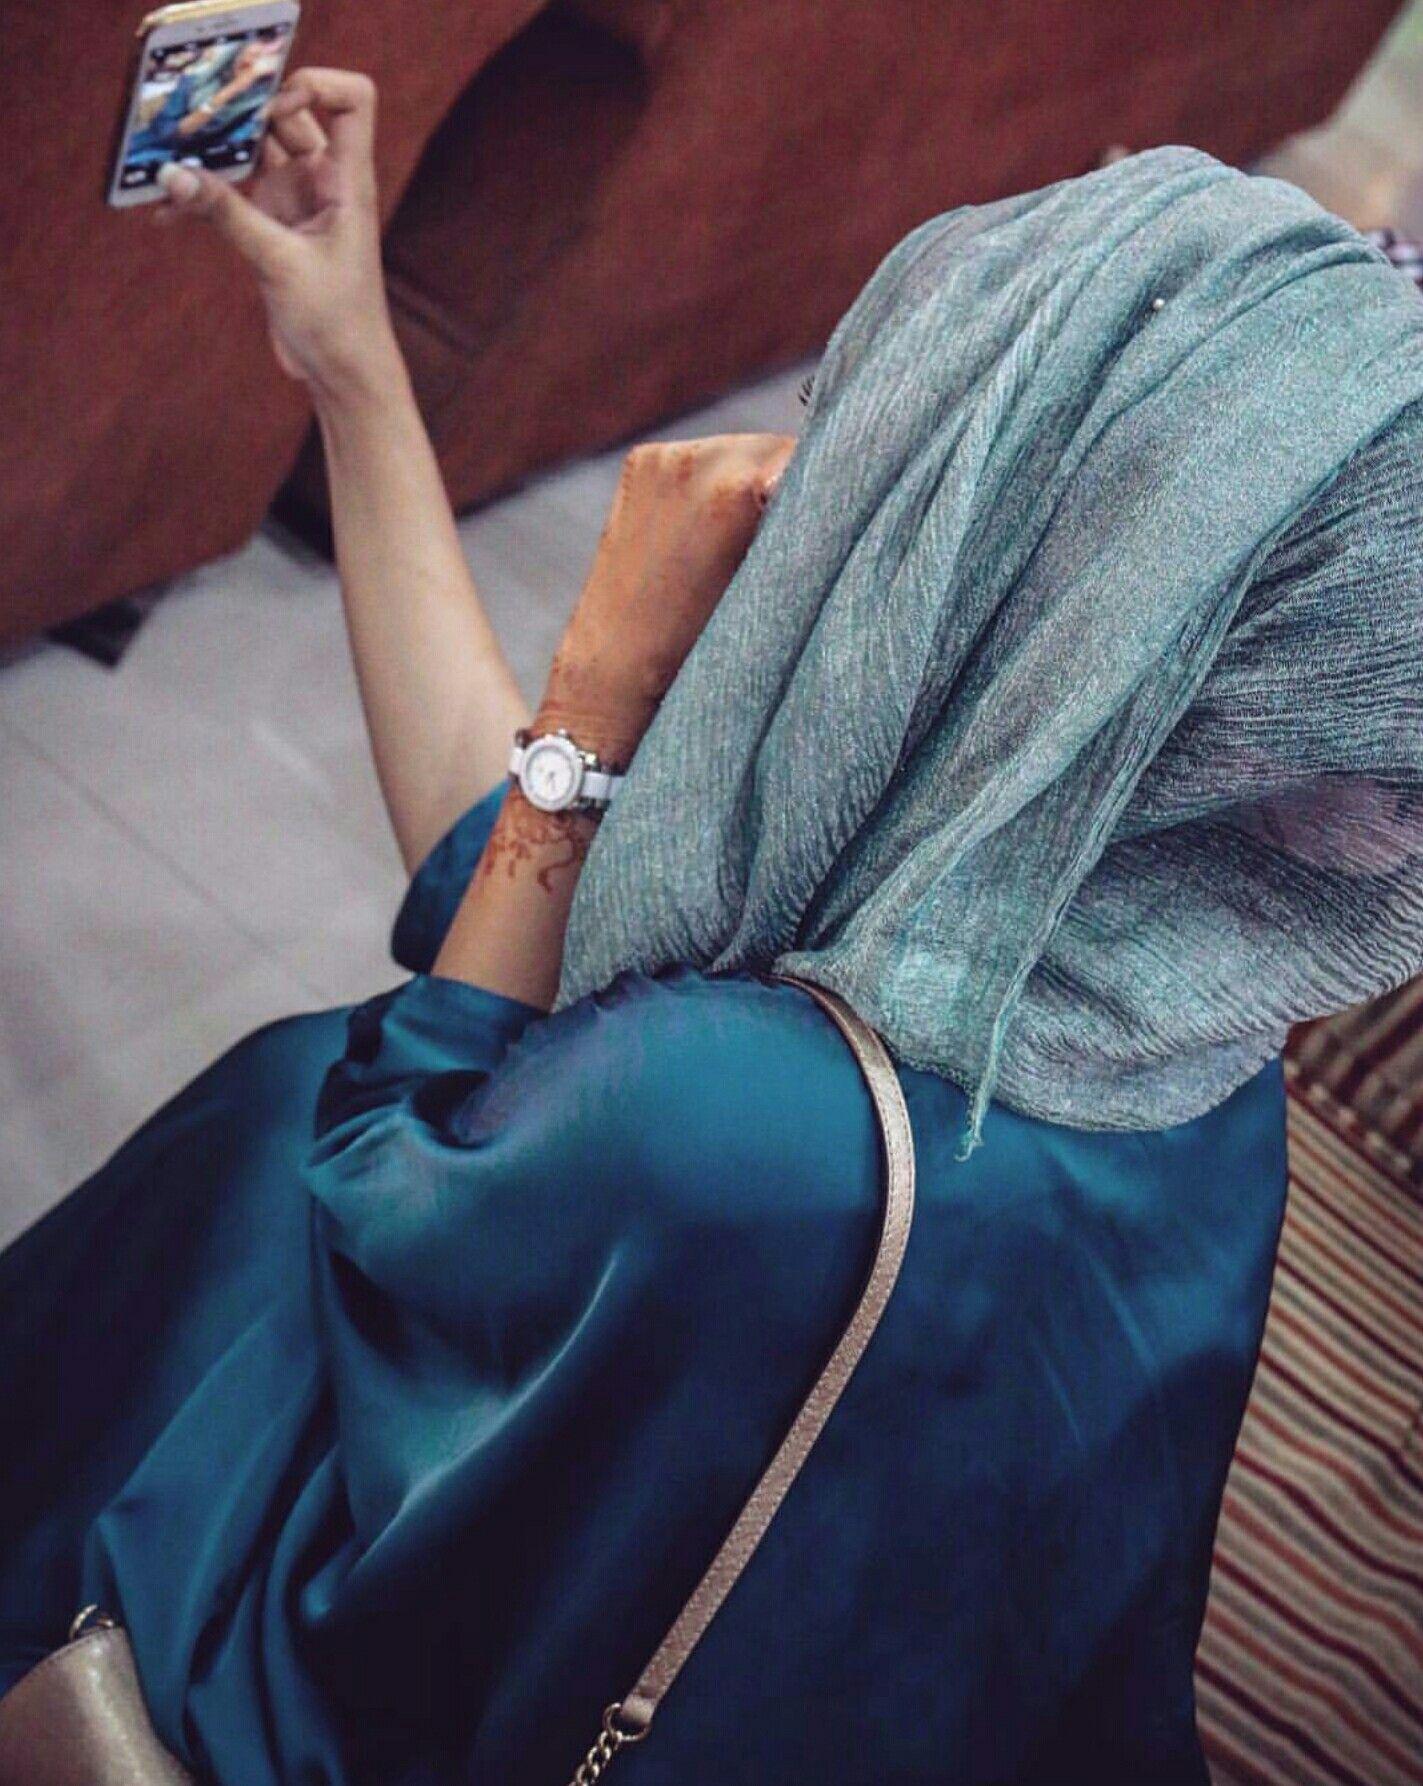 Pin by Farukh Amin on Women's fashion | Pinterest | Muslim girls, Hijabs and Hijab street styles